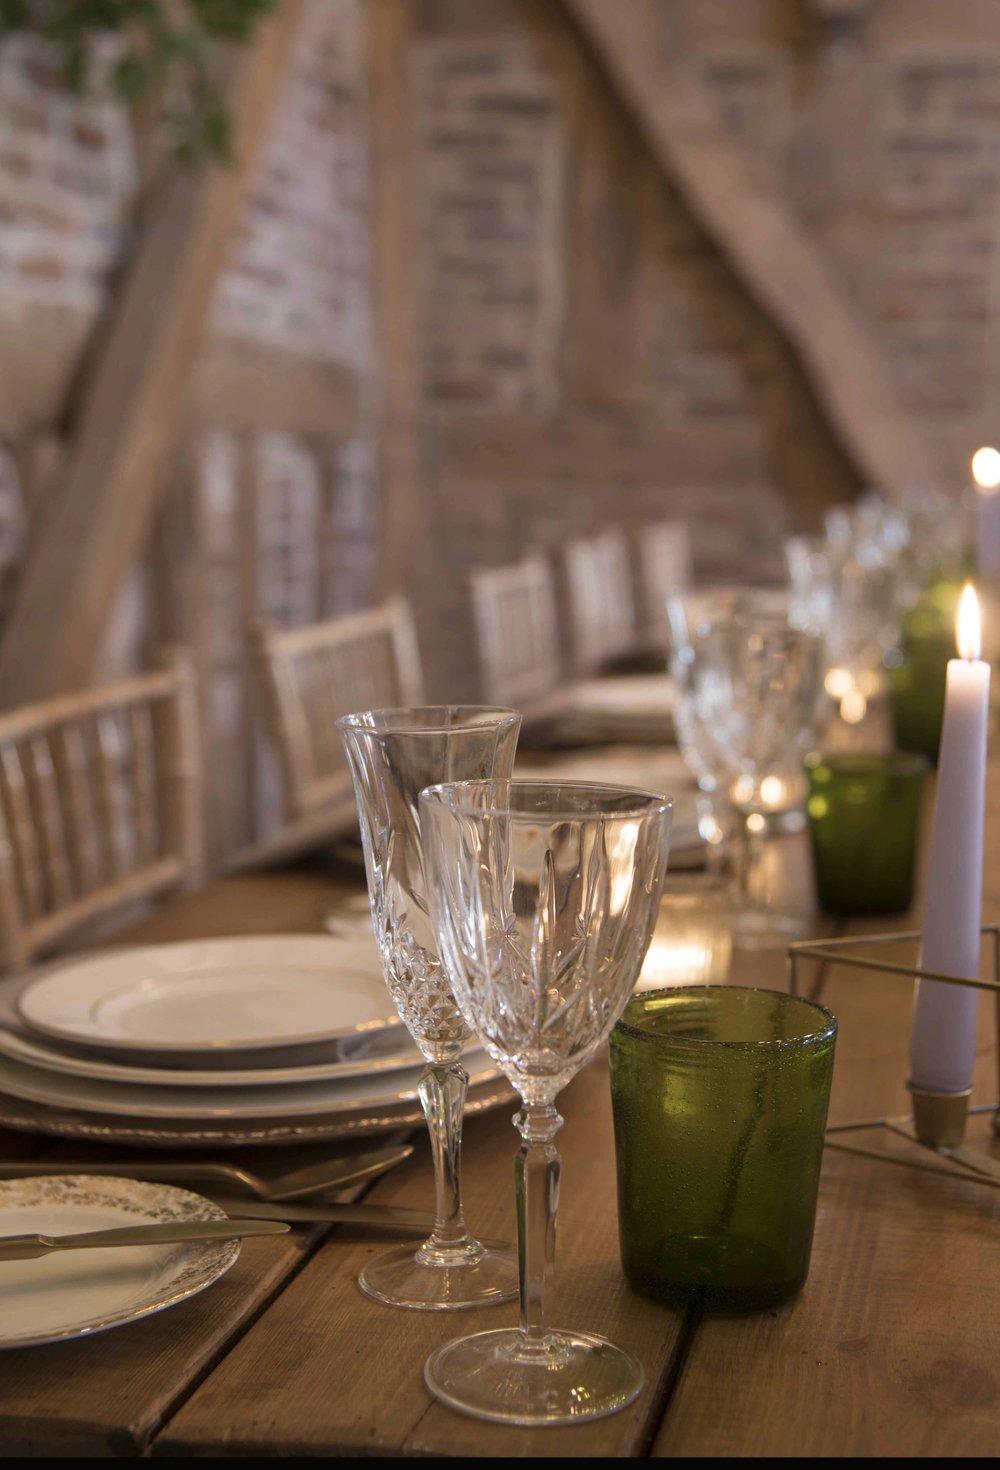 Wedding setting with crystal glasses.jpg